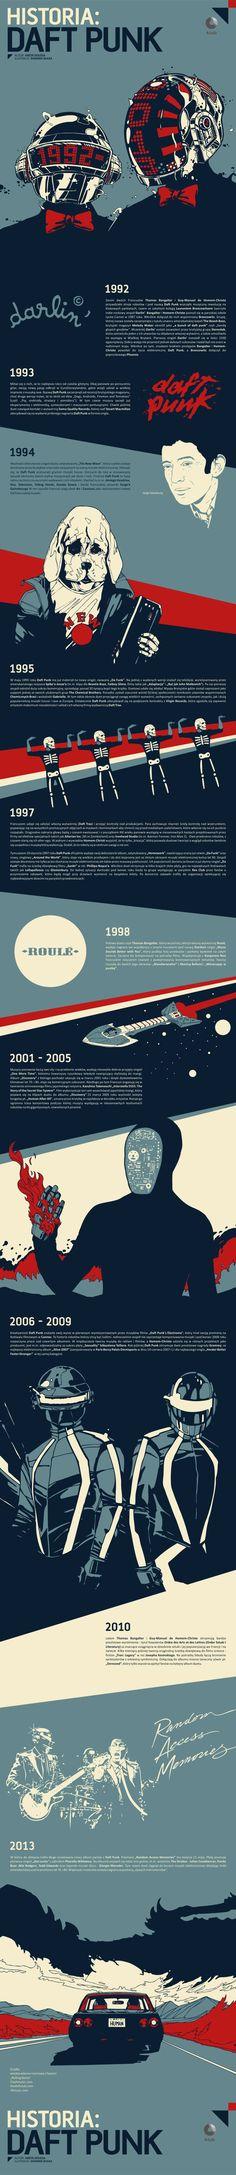 Historia Daft Punk by Marcin Kowalik